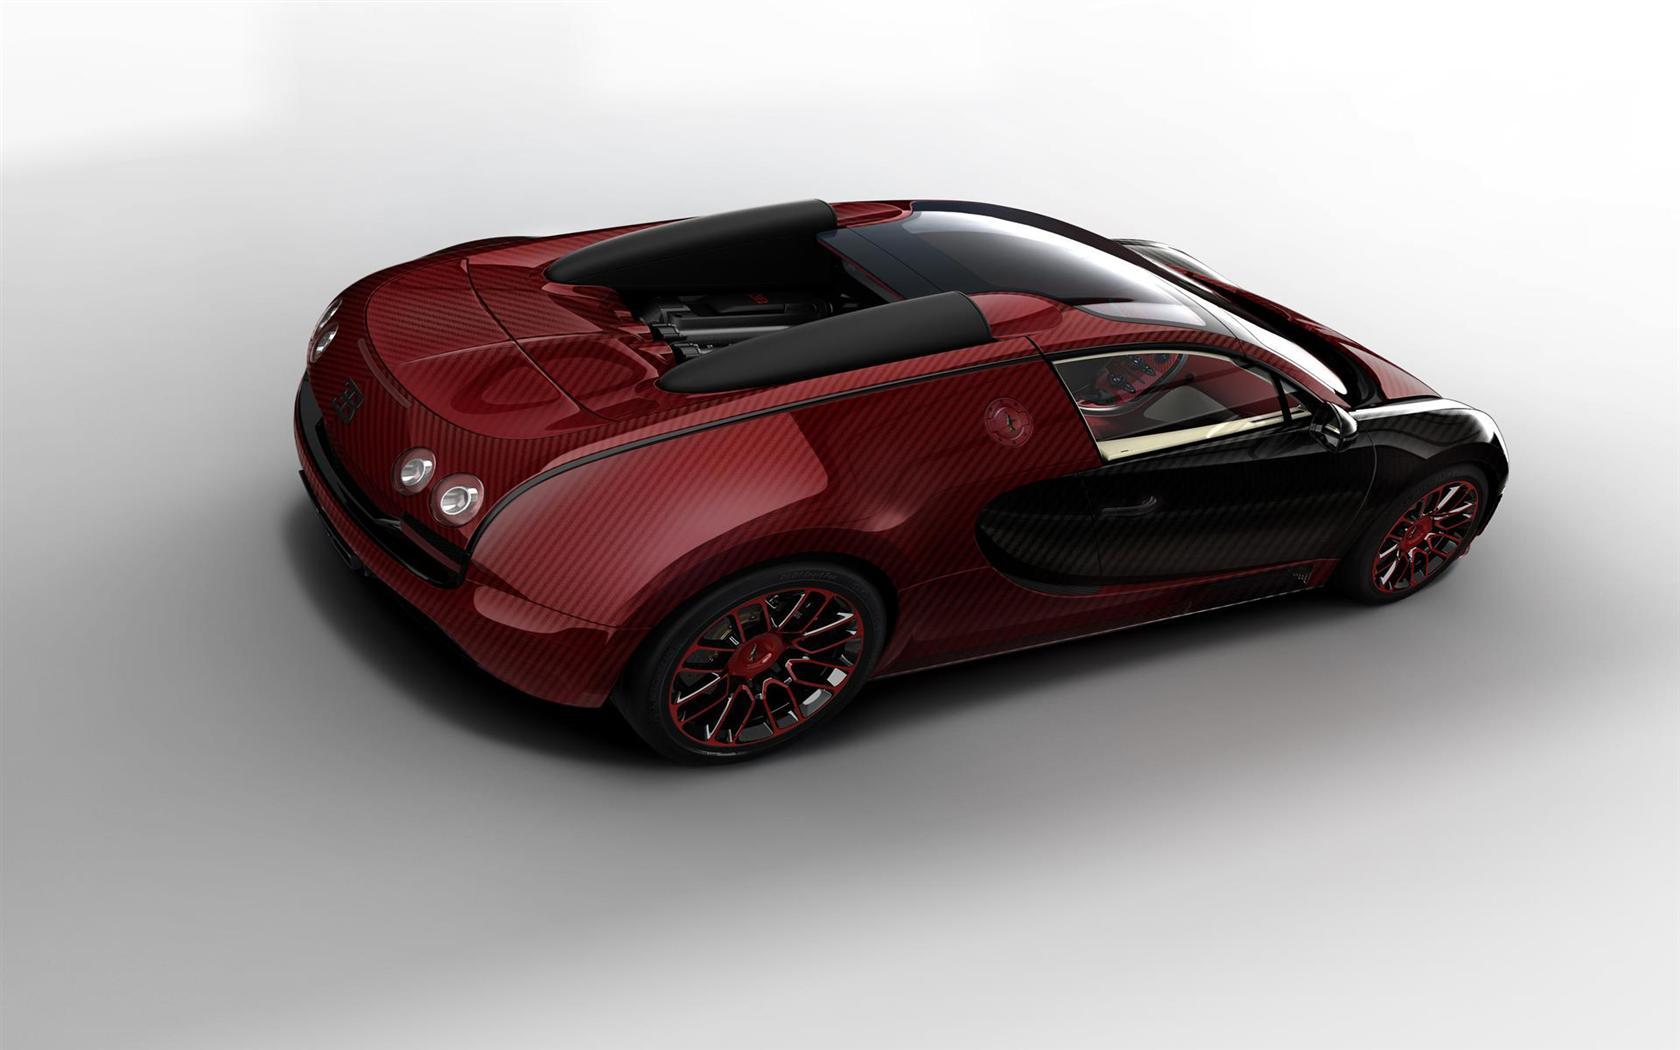 2015 bugatti veyron grand sport vitesse la finale image. Black Bedroom Furniture Sets. Home Design Ideas